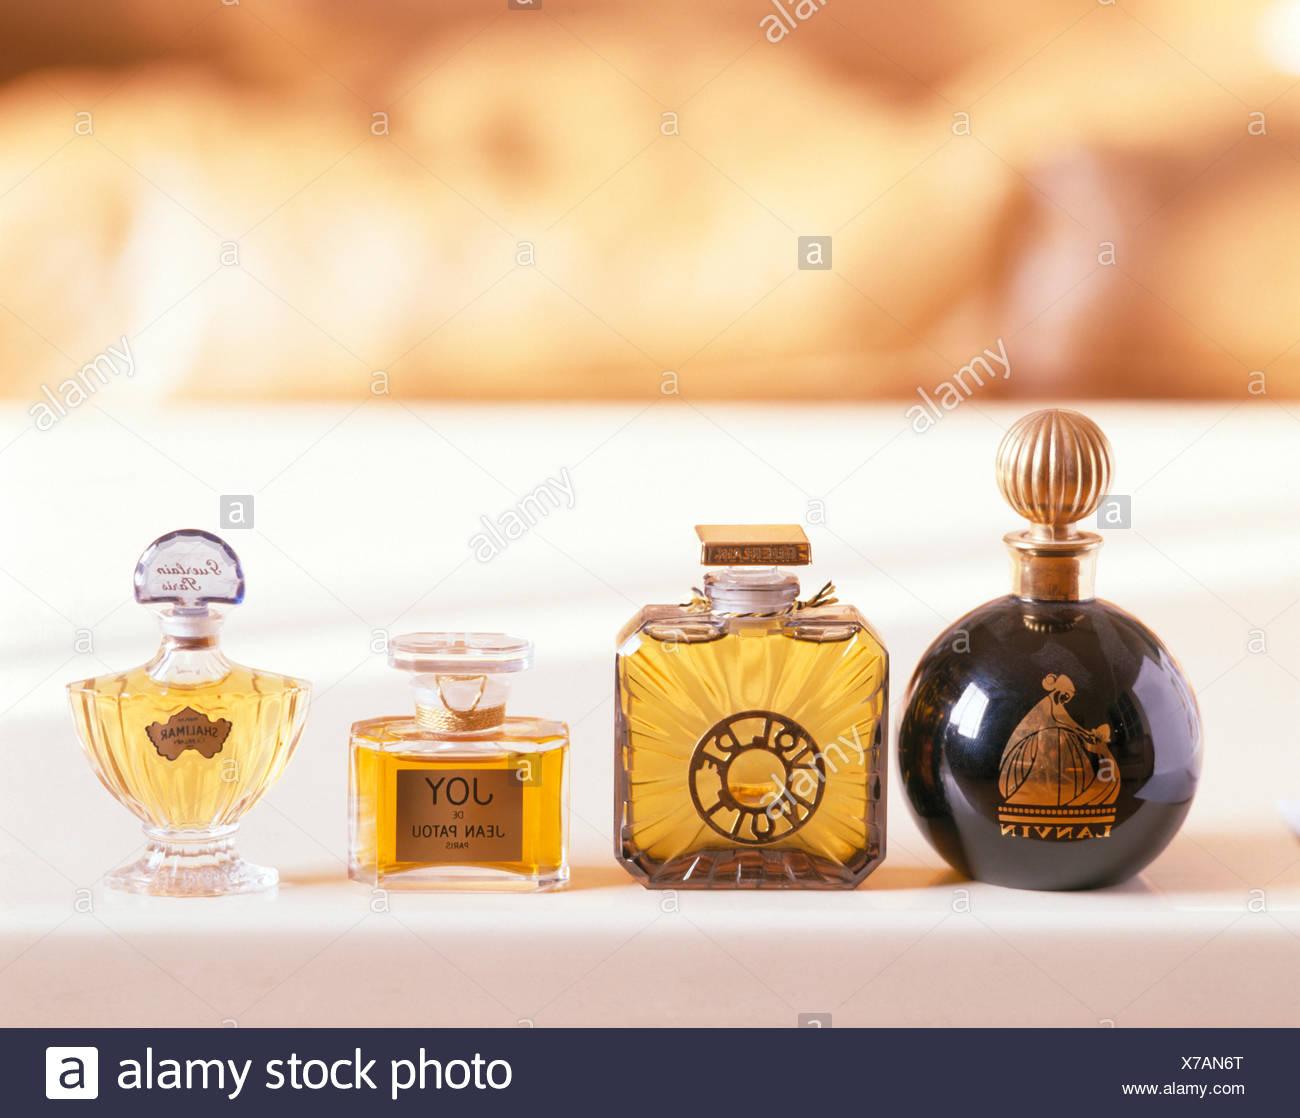 Close-up of vintage French perfume bottles - Stock Image